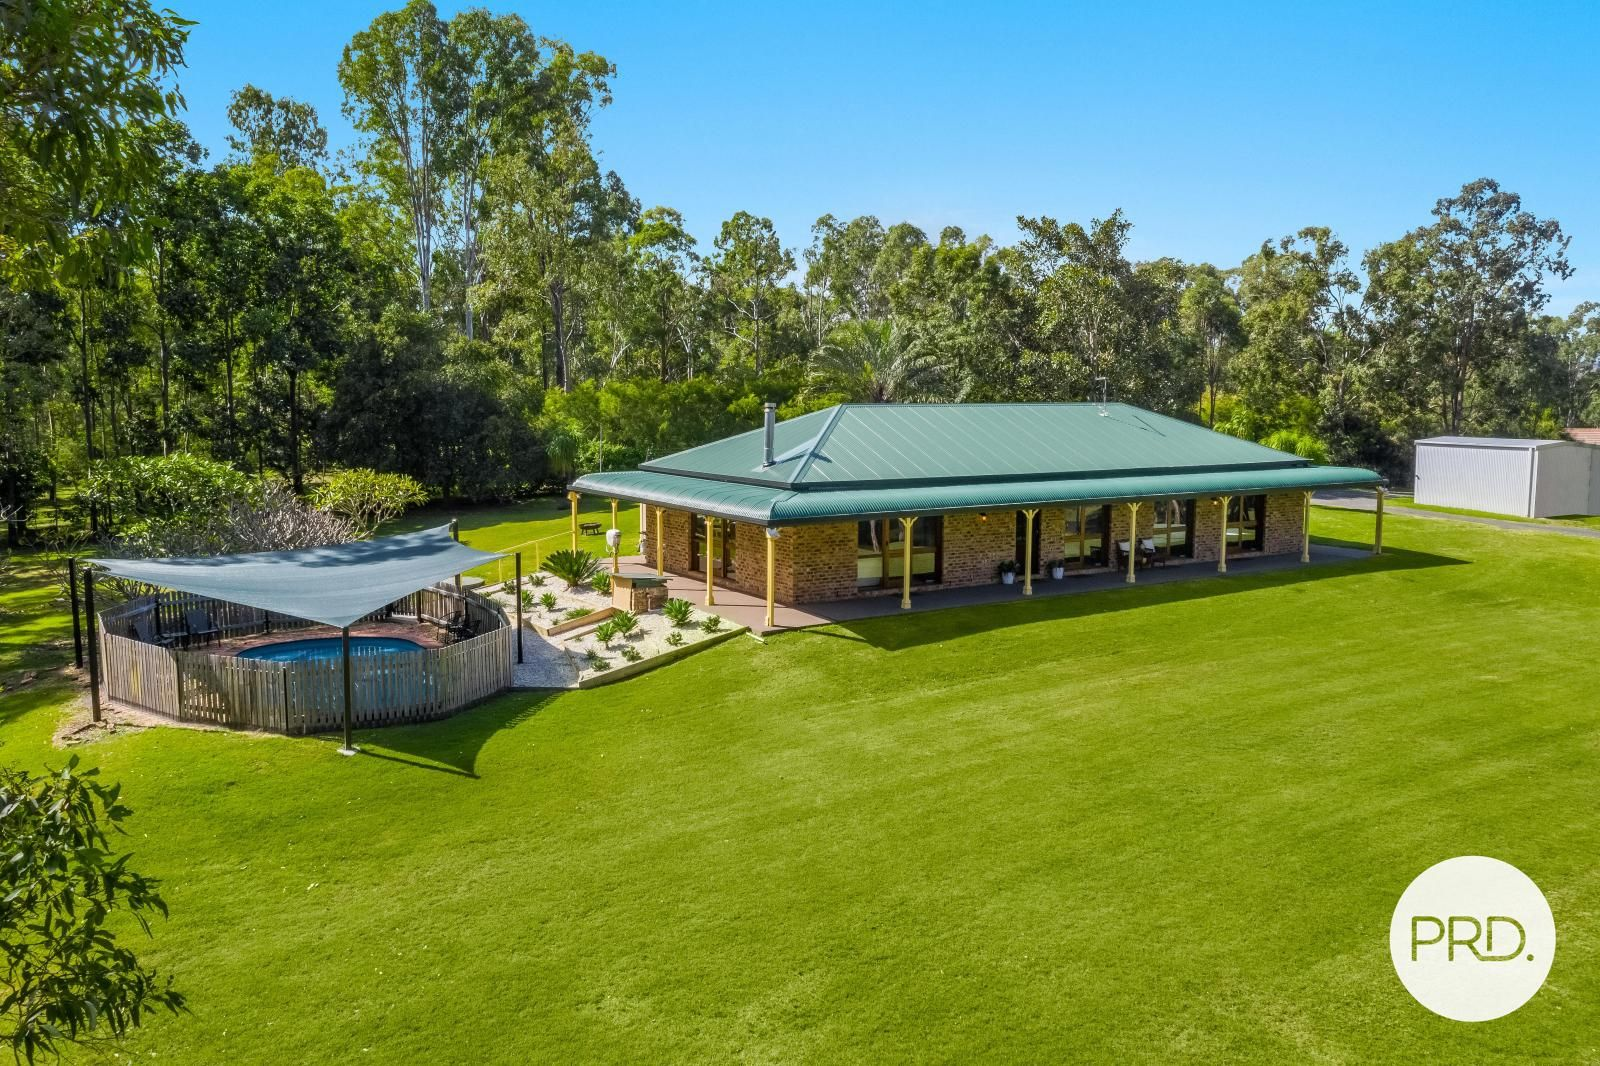 50 Brahman Way, North Casino NSW 2470, Image 1